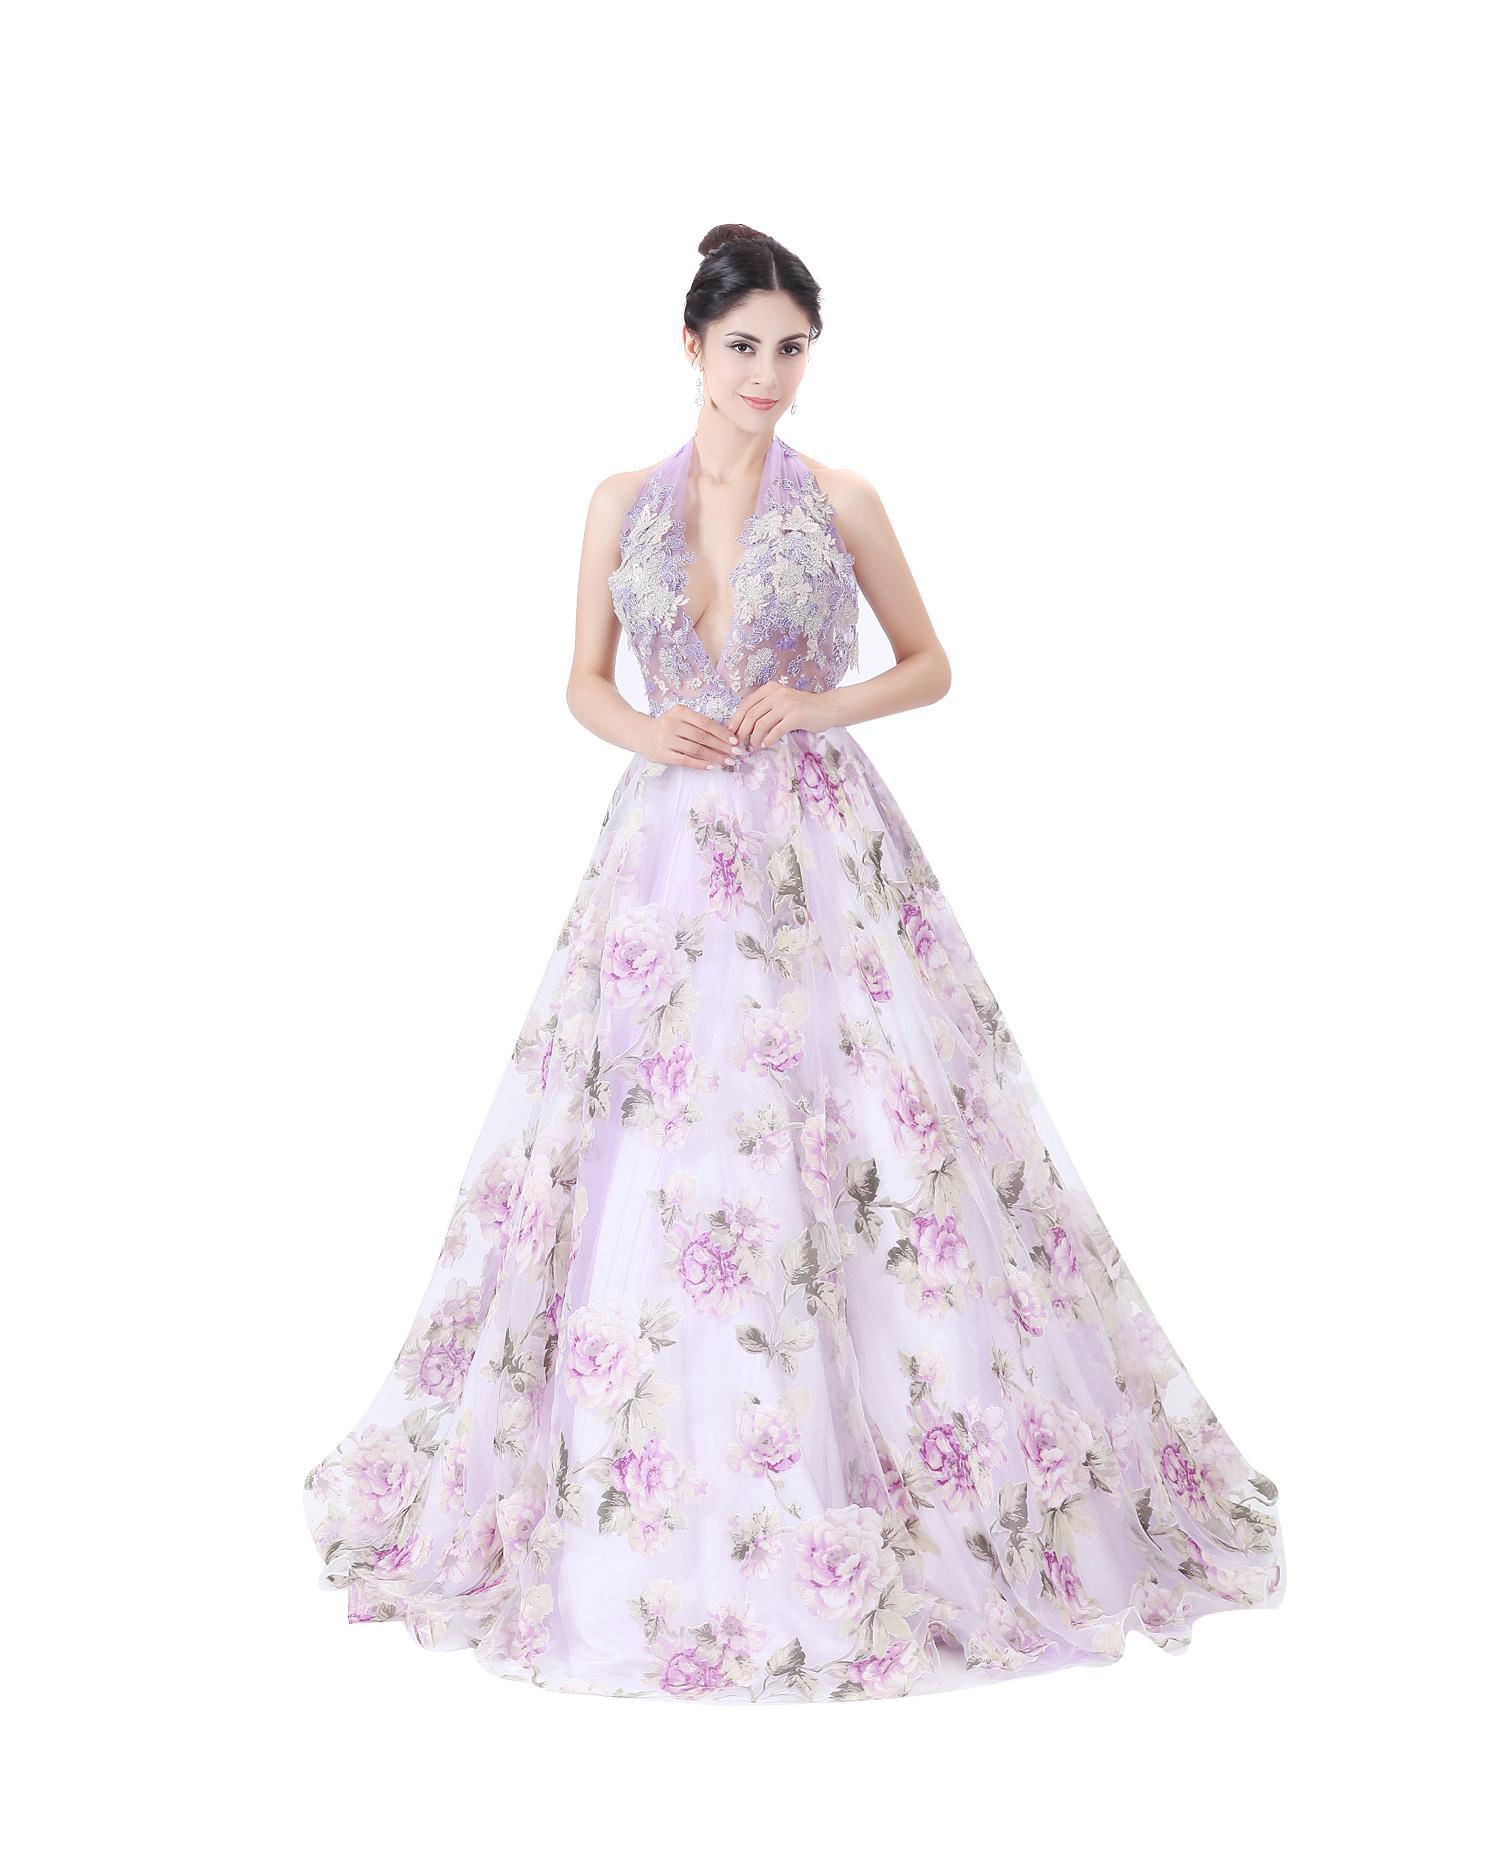 modabelle Women's Organza Print Wedding Dress Advanced Customization Formal V-neck Bridal Dresses Robe De Mariee 2017